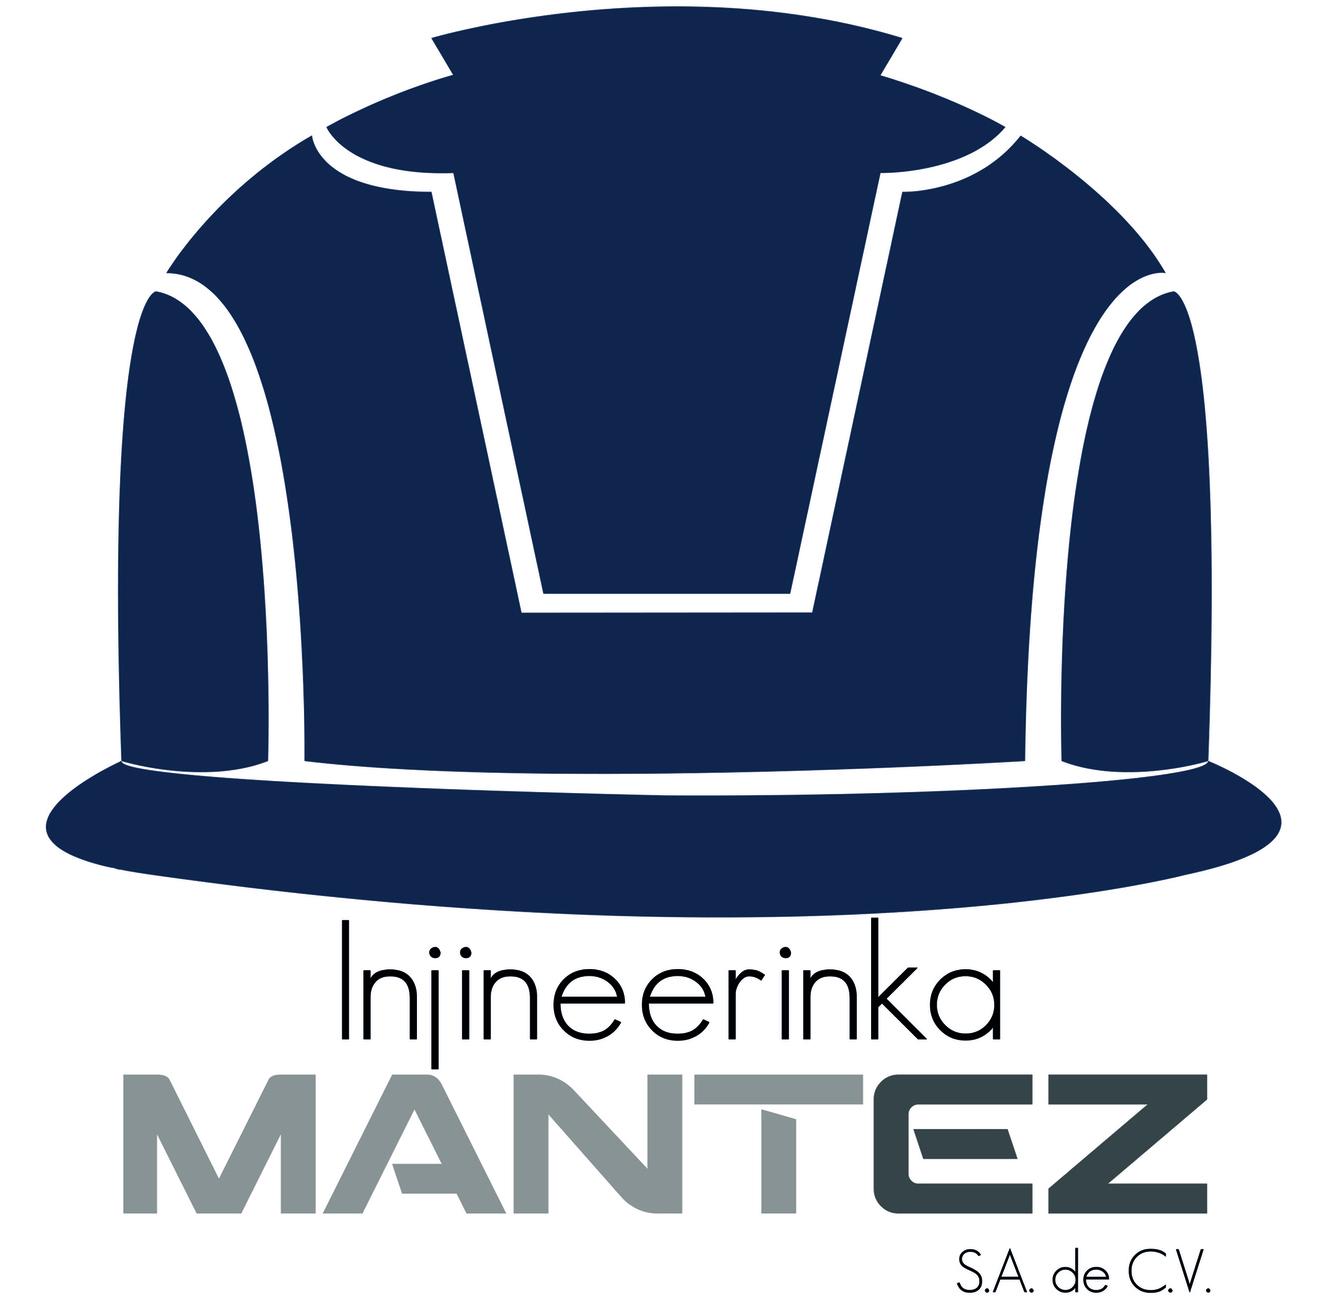 Injineerinka MANTEZ S.A. de C.V.